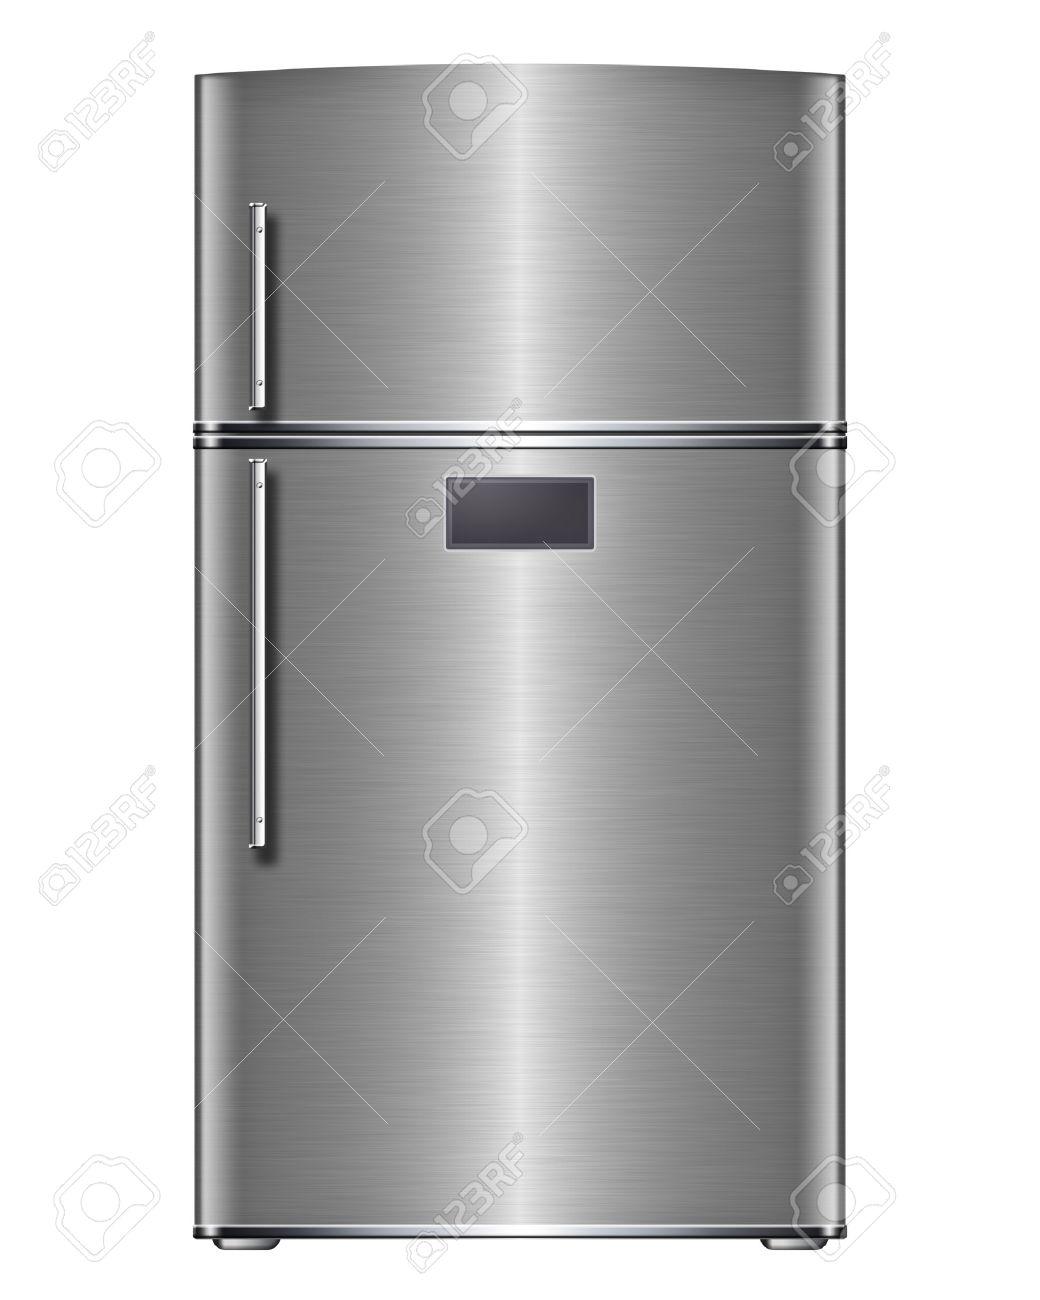 Modern steel refrigerator - isolated on white background - 26026772